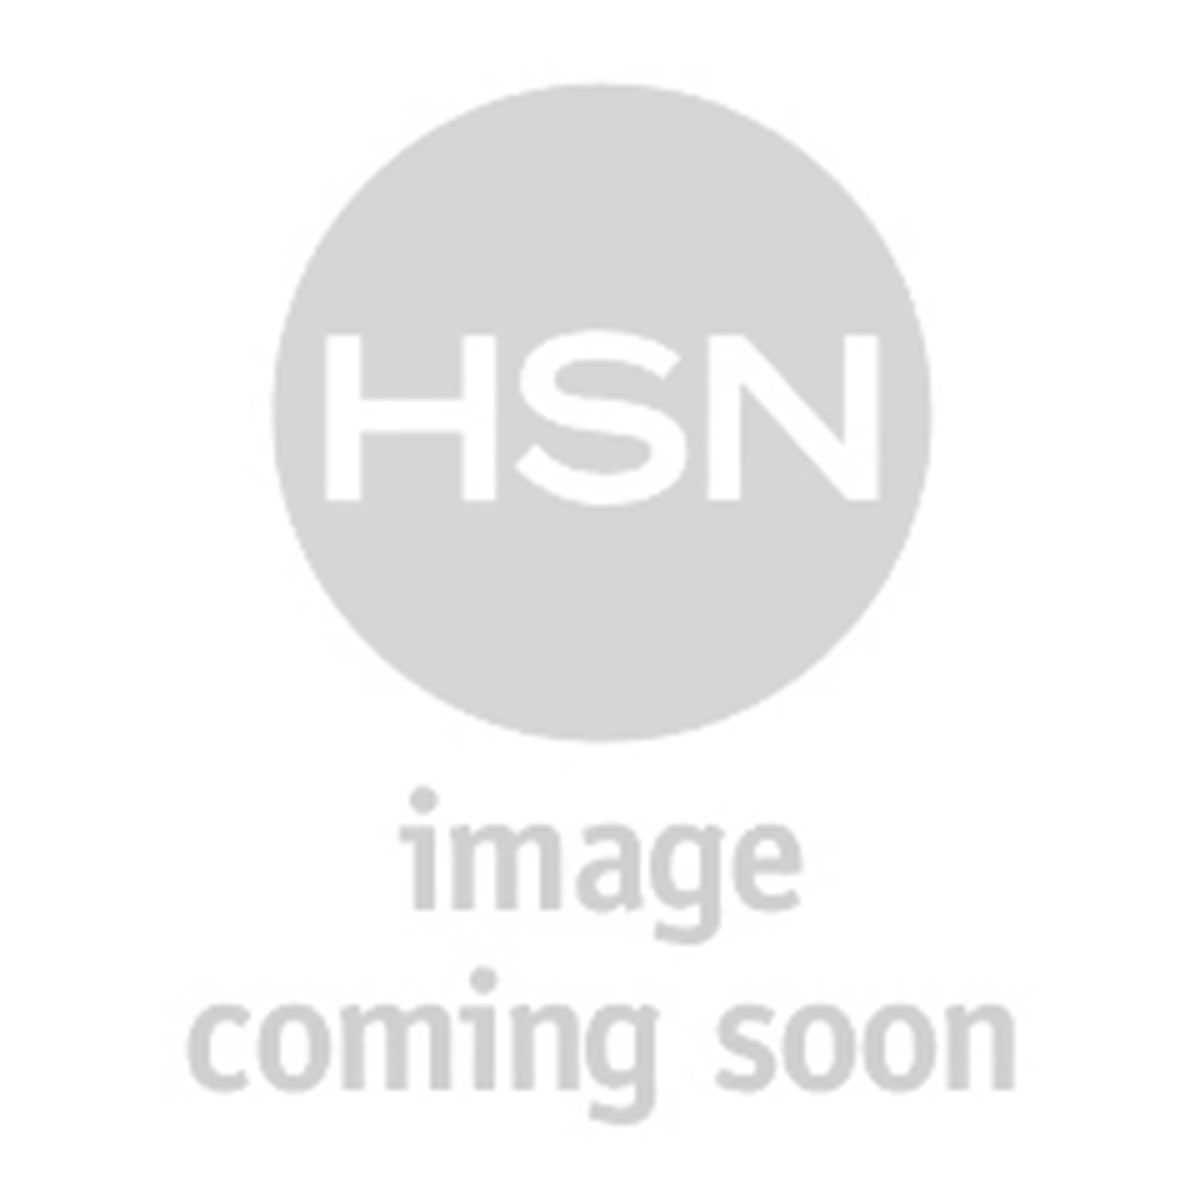 origami folding kitchen island cart yellow mat ybf brighten, hide and sculpt concealer makeup | hsn